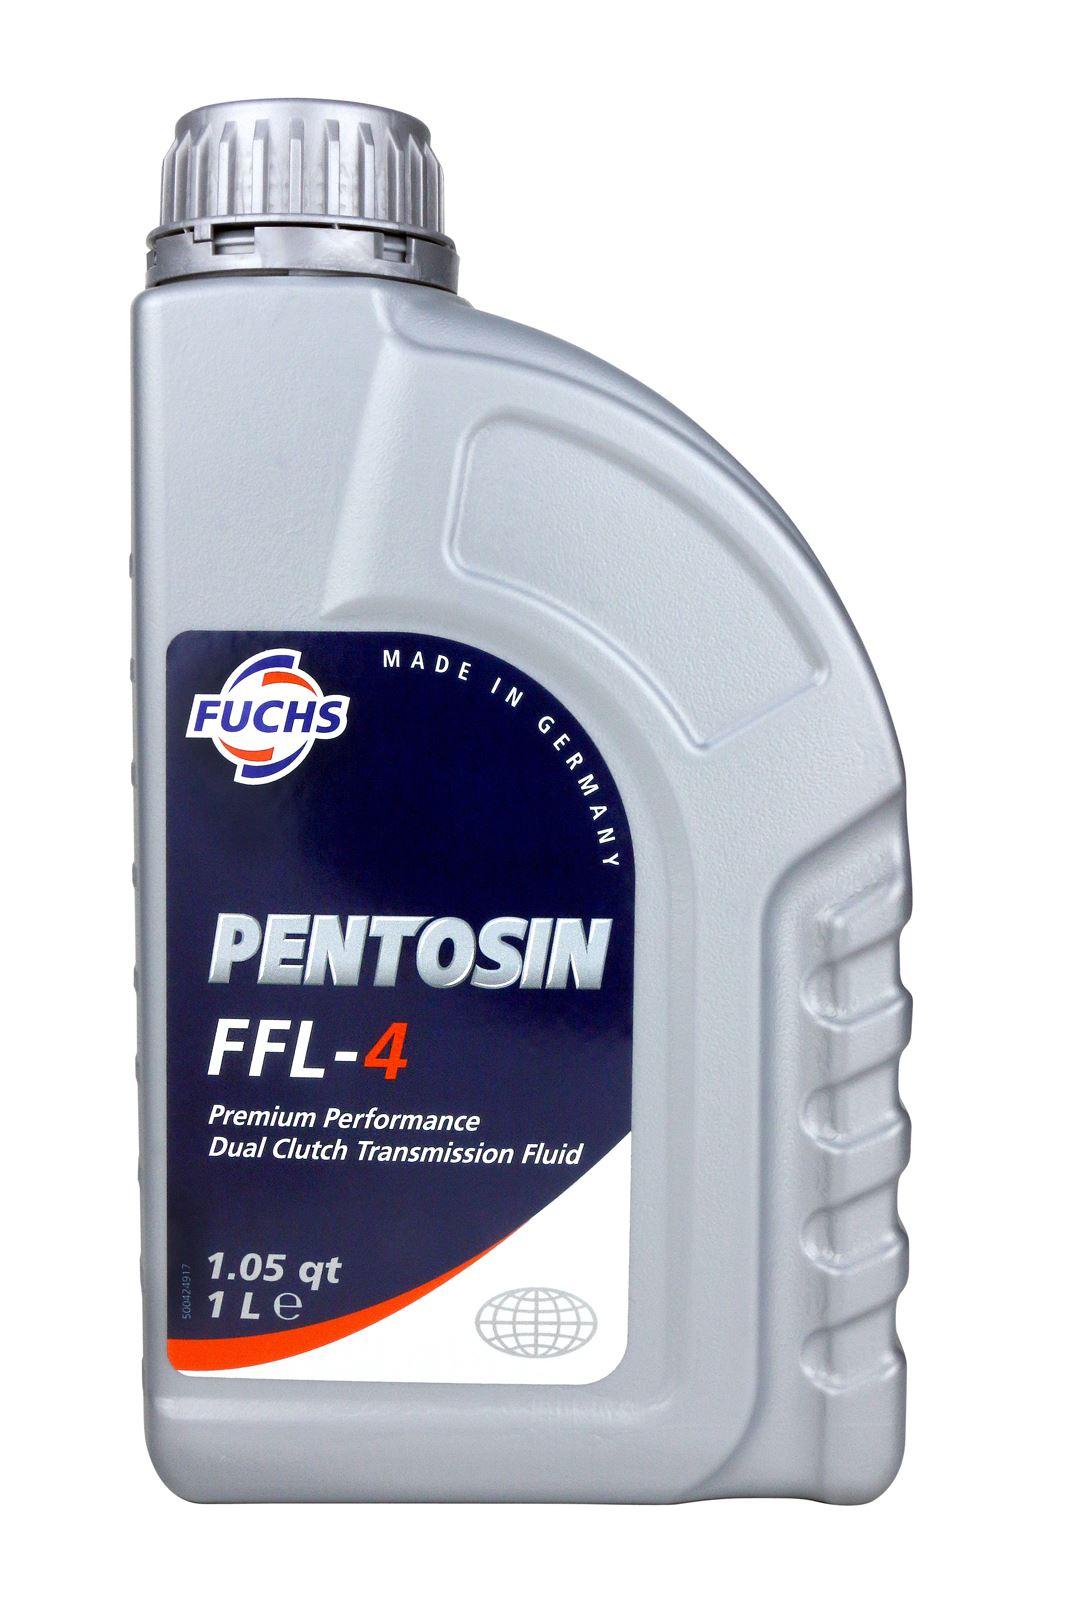 BMW Convertible bmw transmission types Pentosin FFL-4 DCT Transmission Fluid, Oil For BMW DCG, GTR, EVO X ...